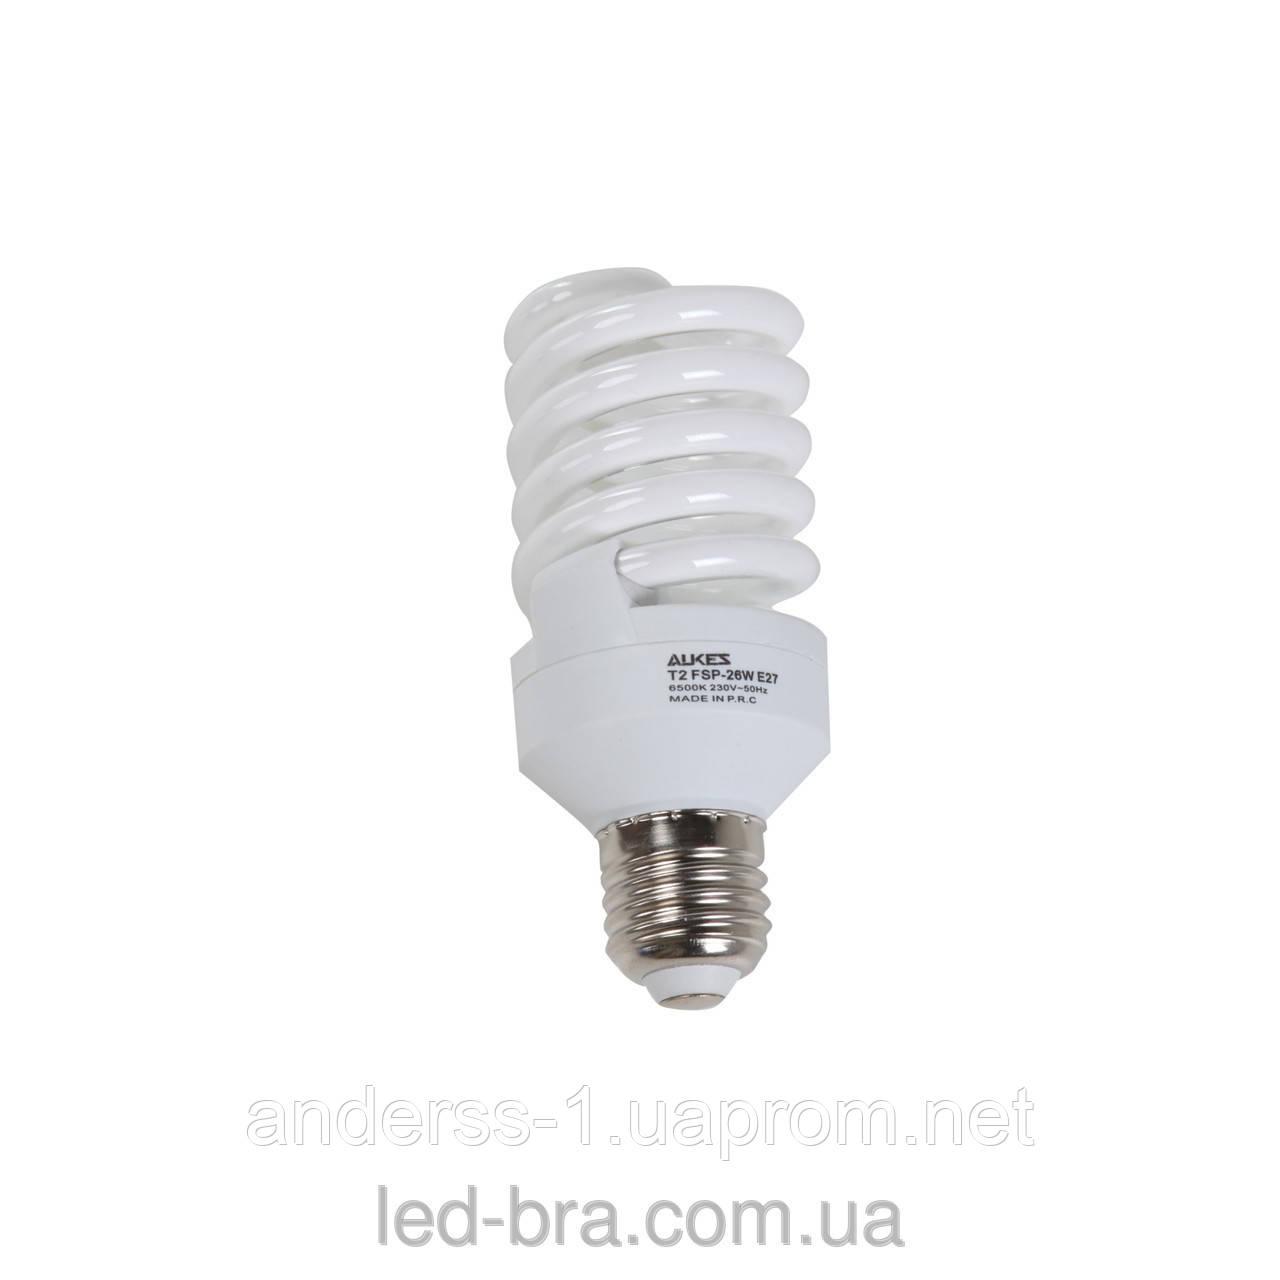 Энергосберегающая лампа 26W